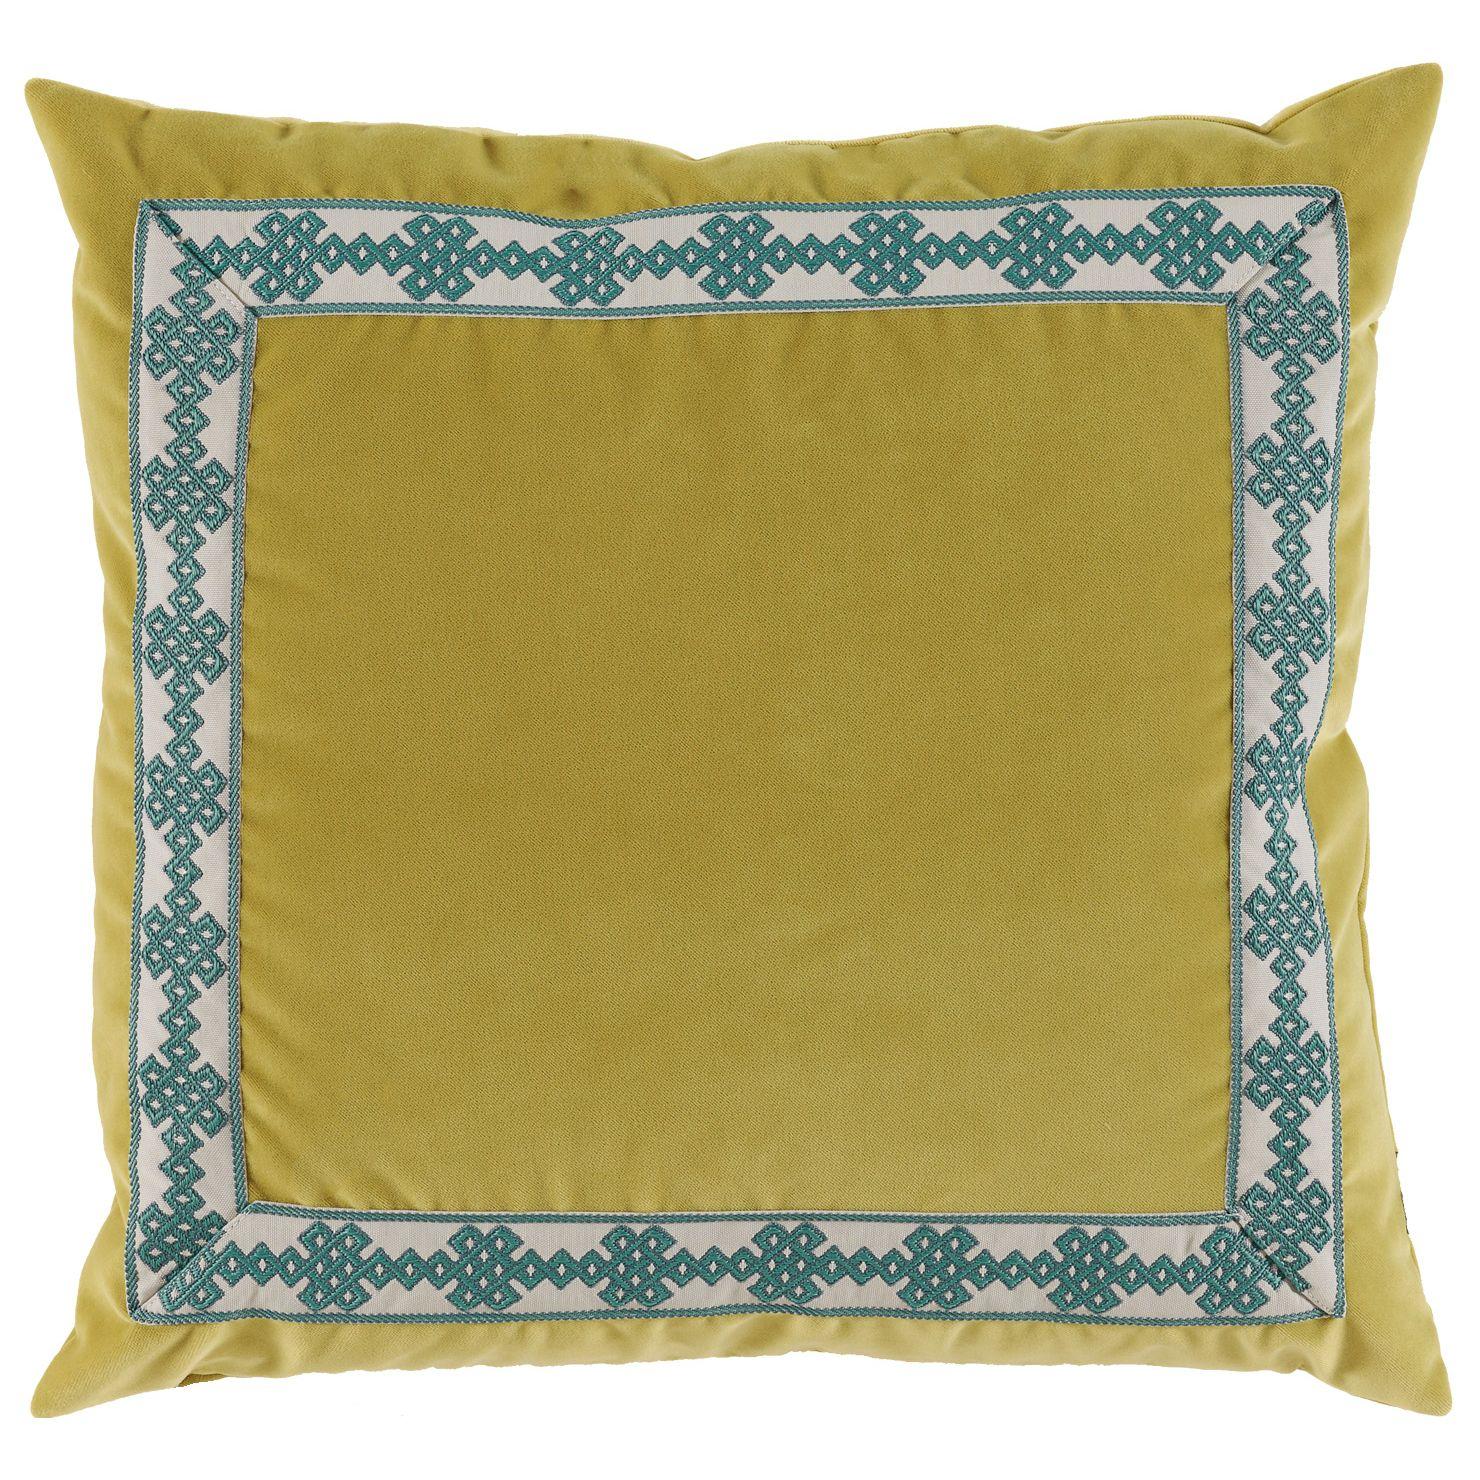 Luxuriously textured in elegant velvet lacefieldus amalfi throw